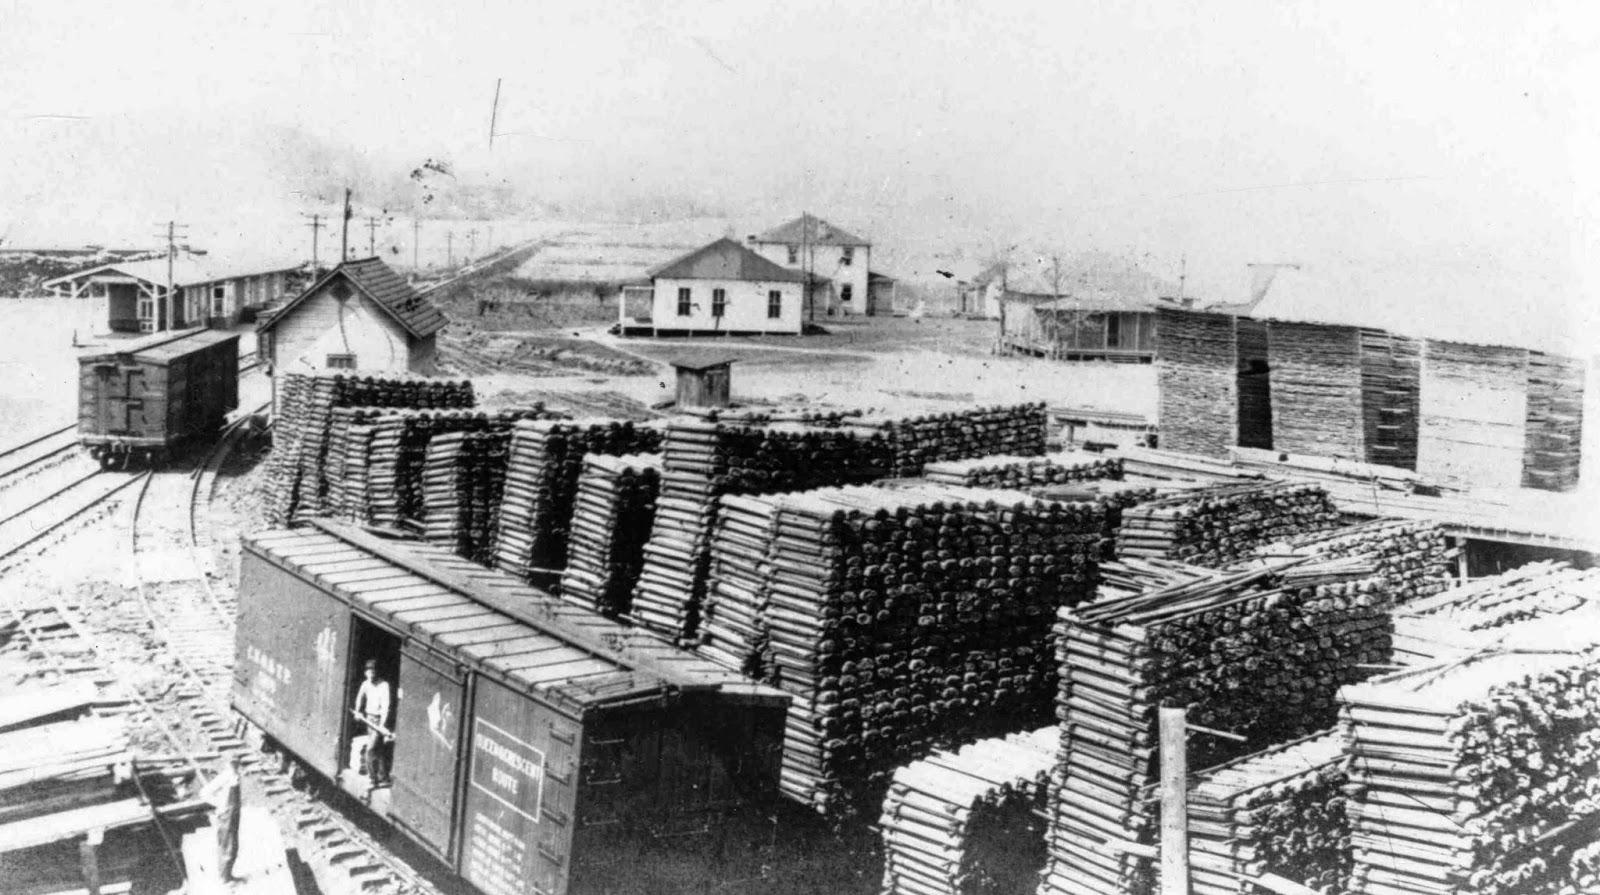 The Rowell Bosse North Carolina Room Saw Mill Lumber